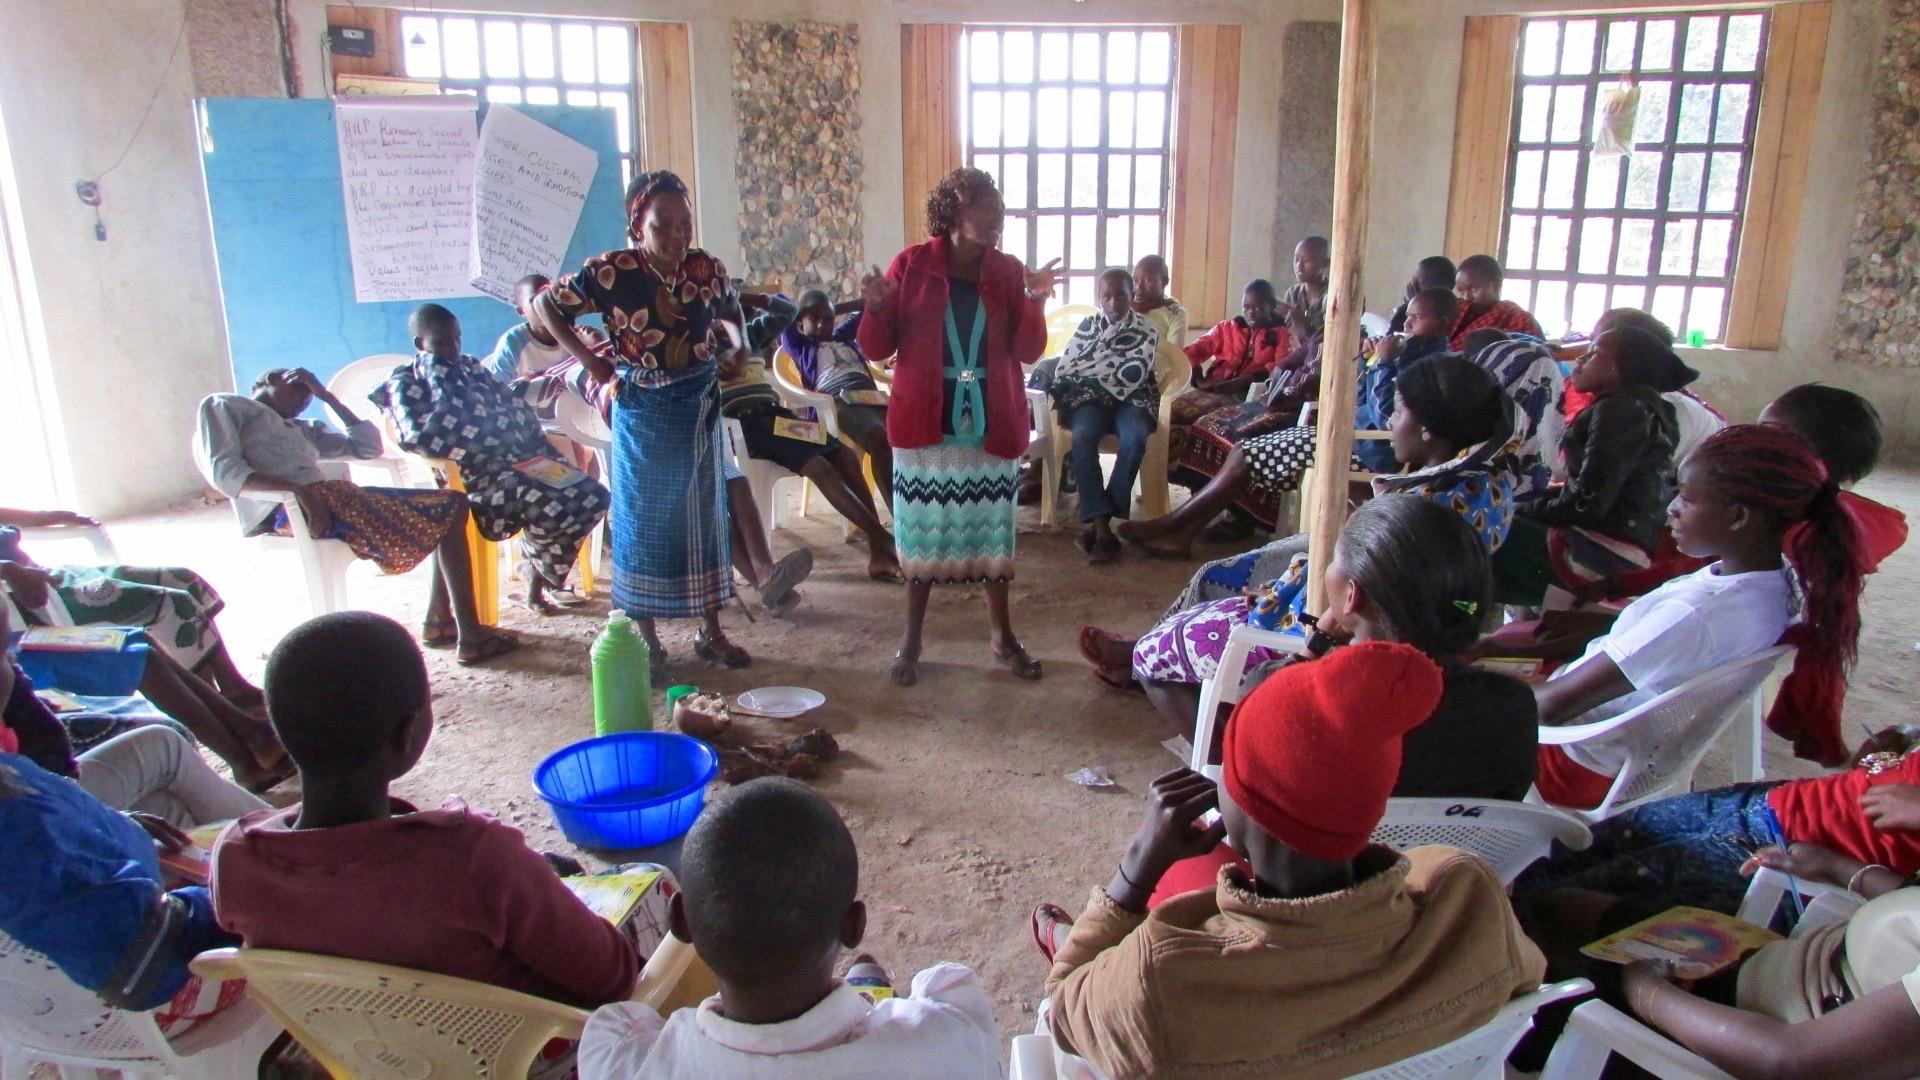 Ex-nurse, Grace, and FGM victim, Angelica, re-enact the ritual of female circumcision